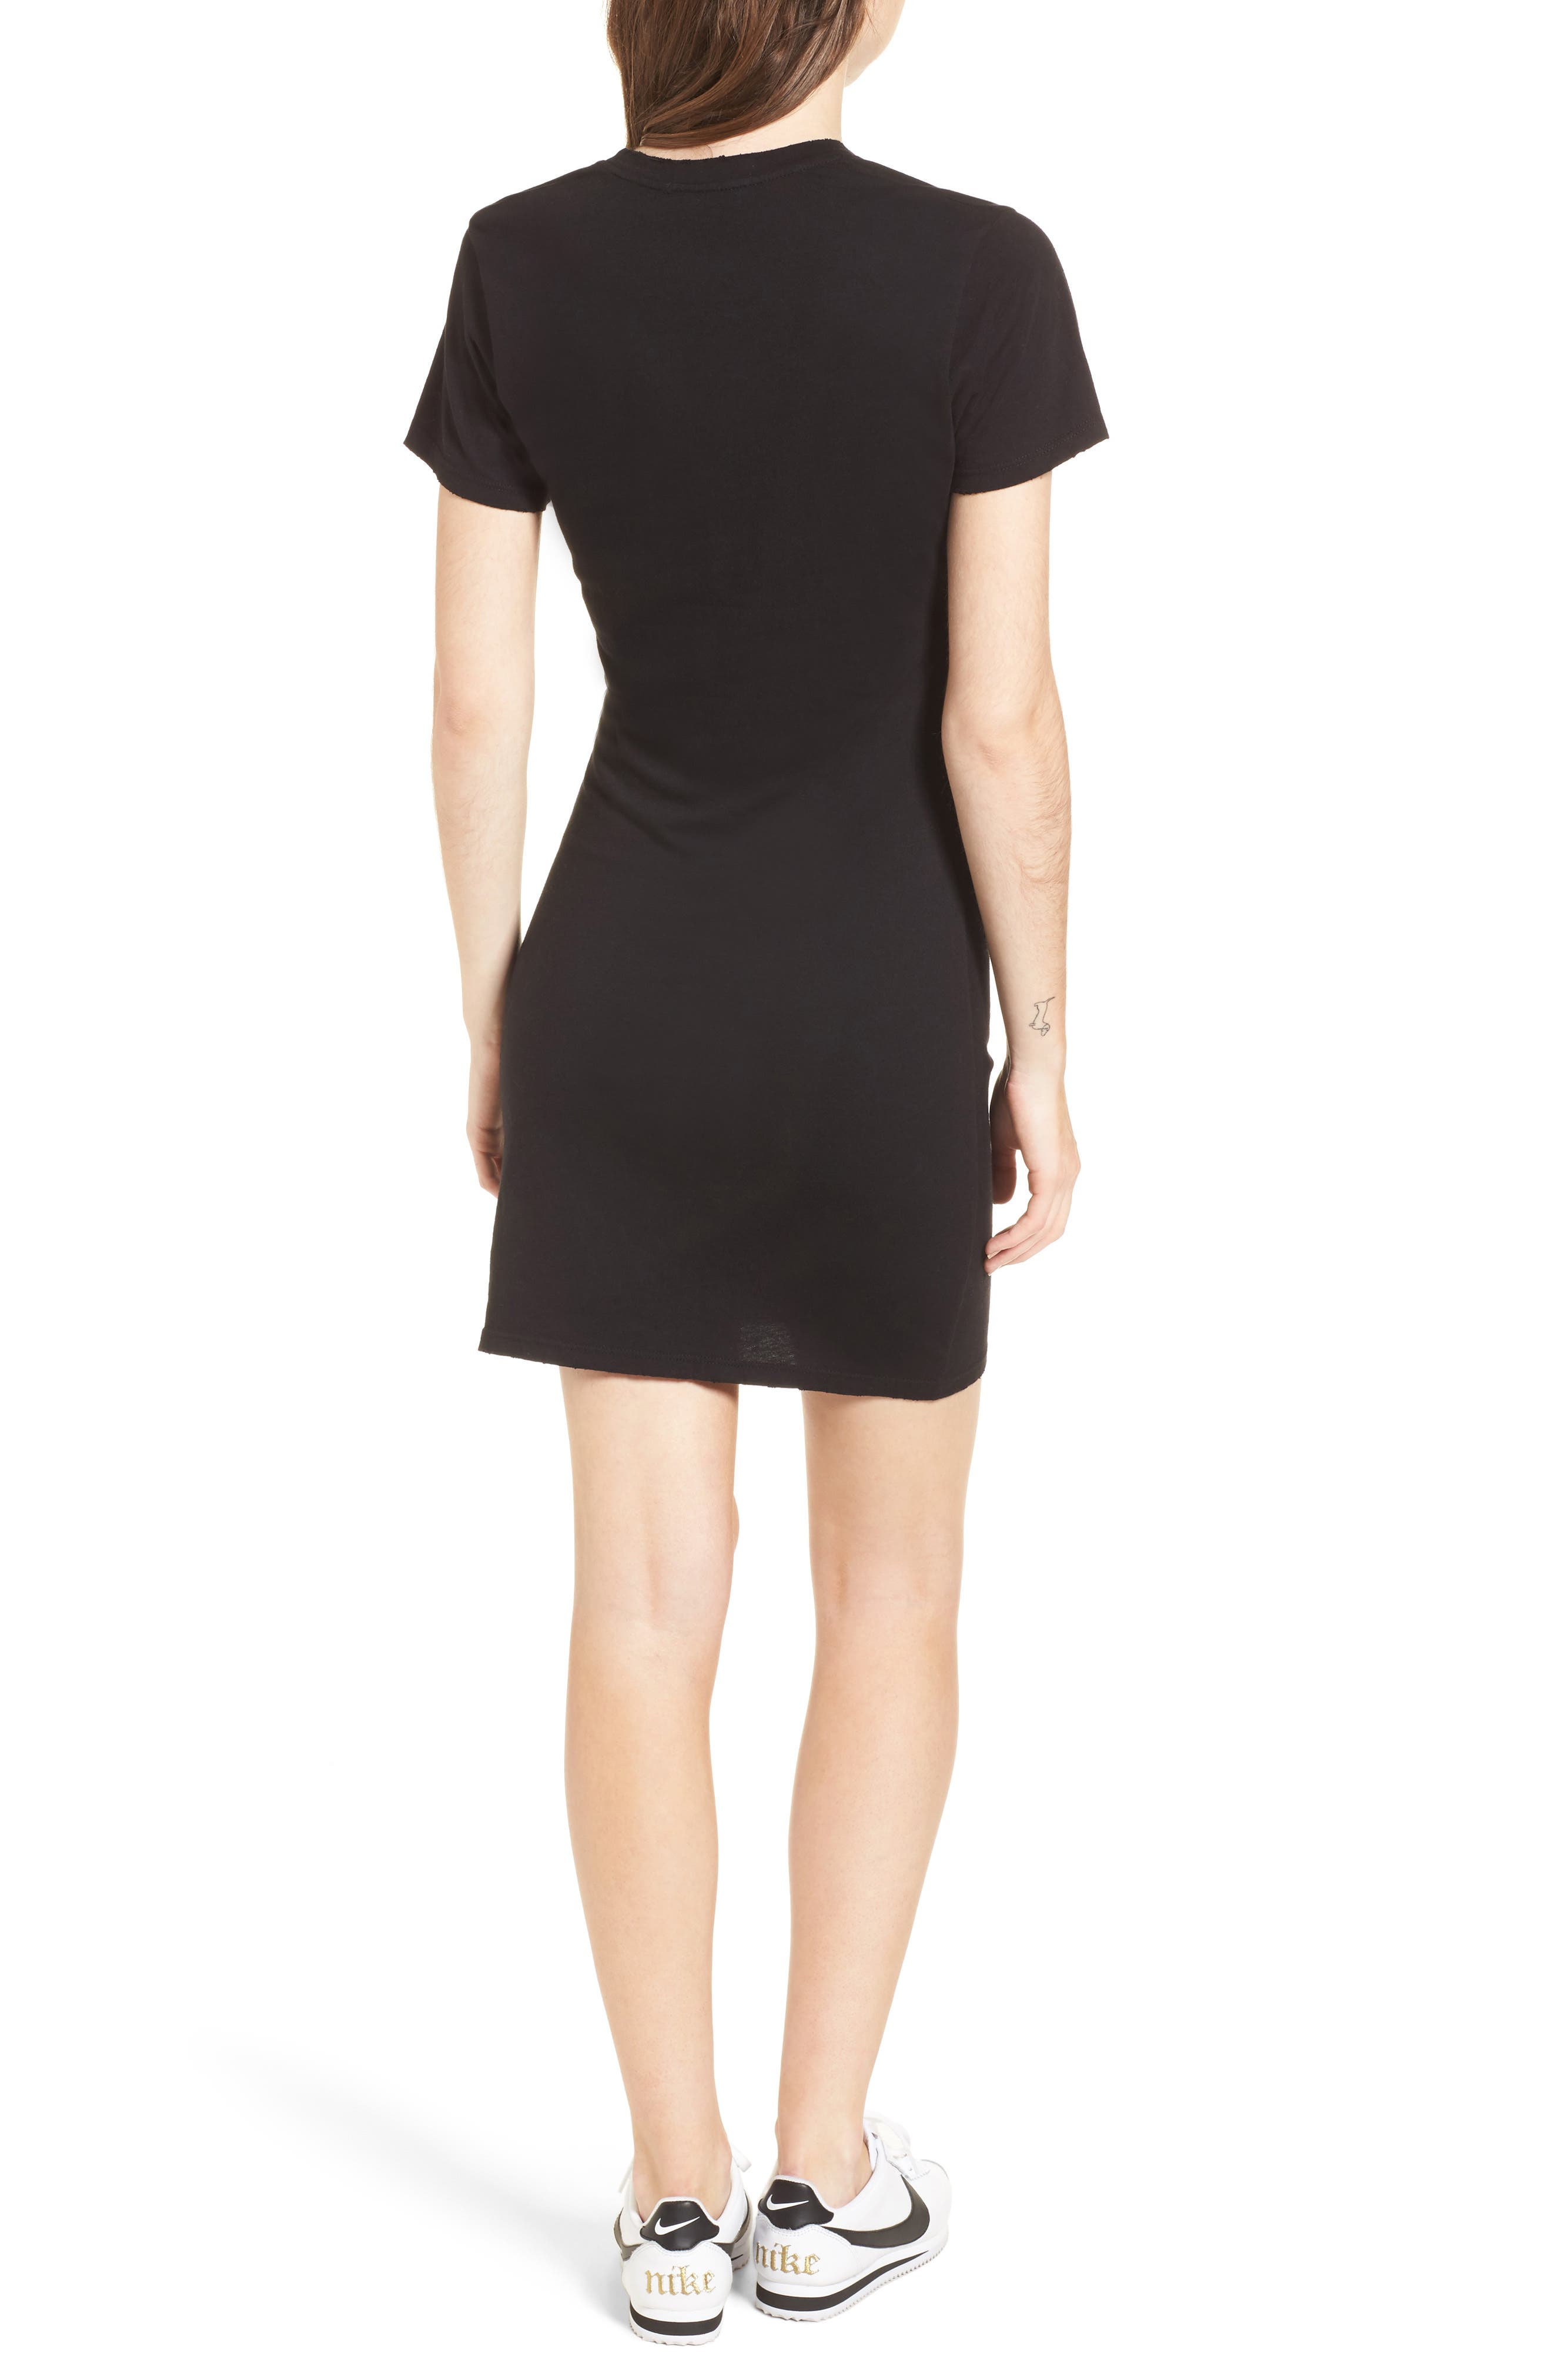 Jazz Knotted T-Shirt Dress,                             Alternate thumbnail 2, color,                             BLACK CAT